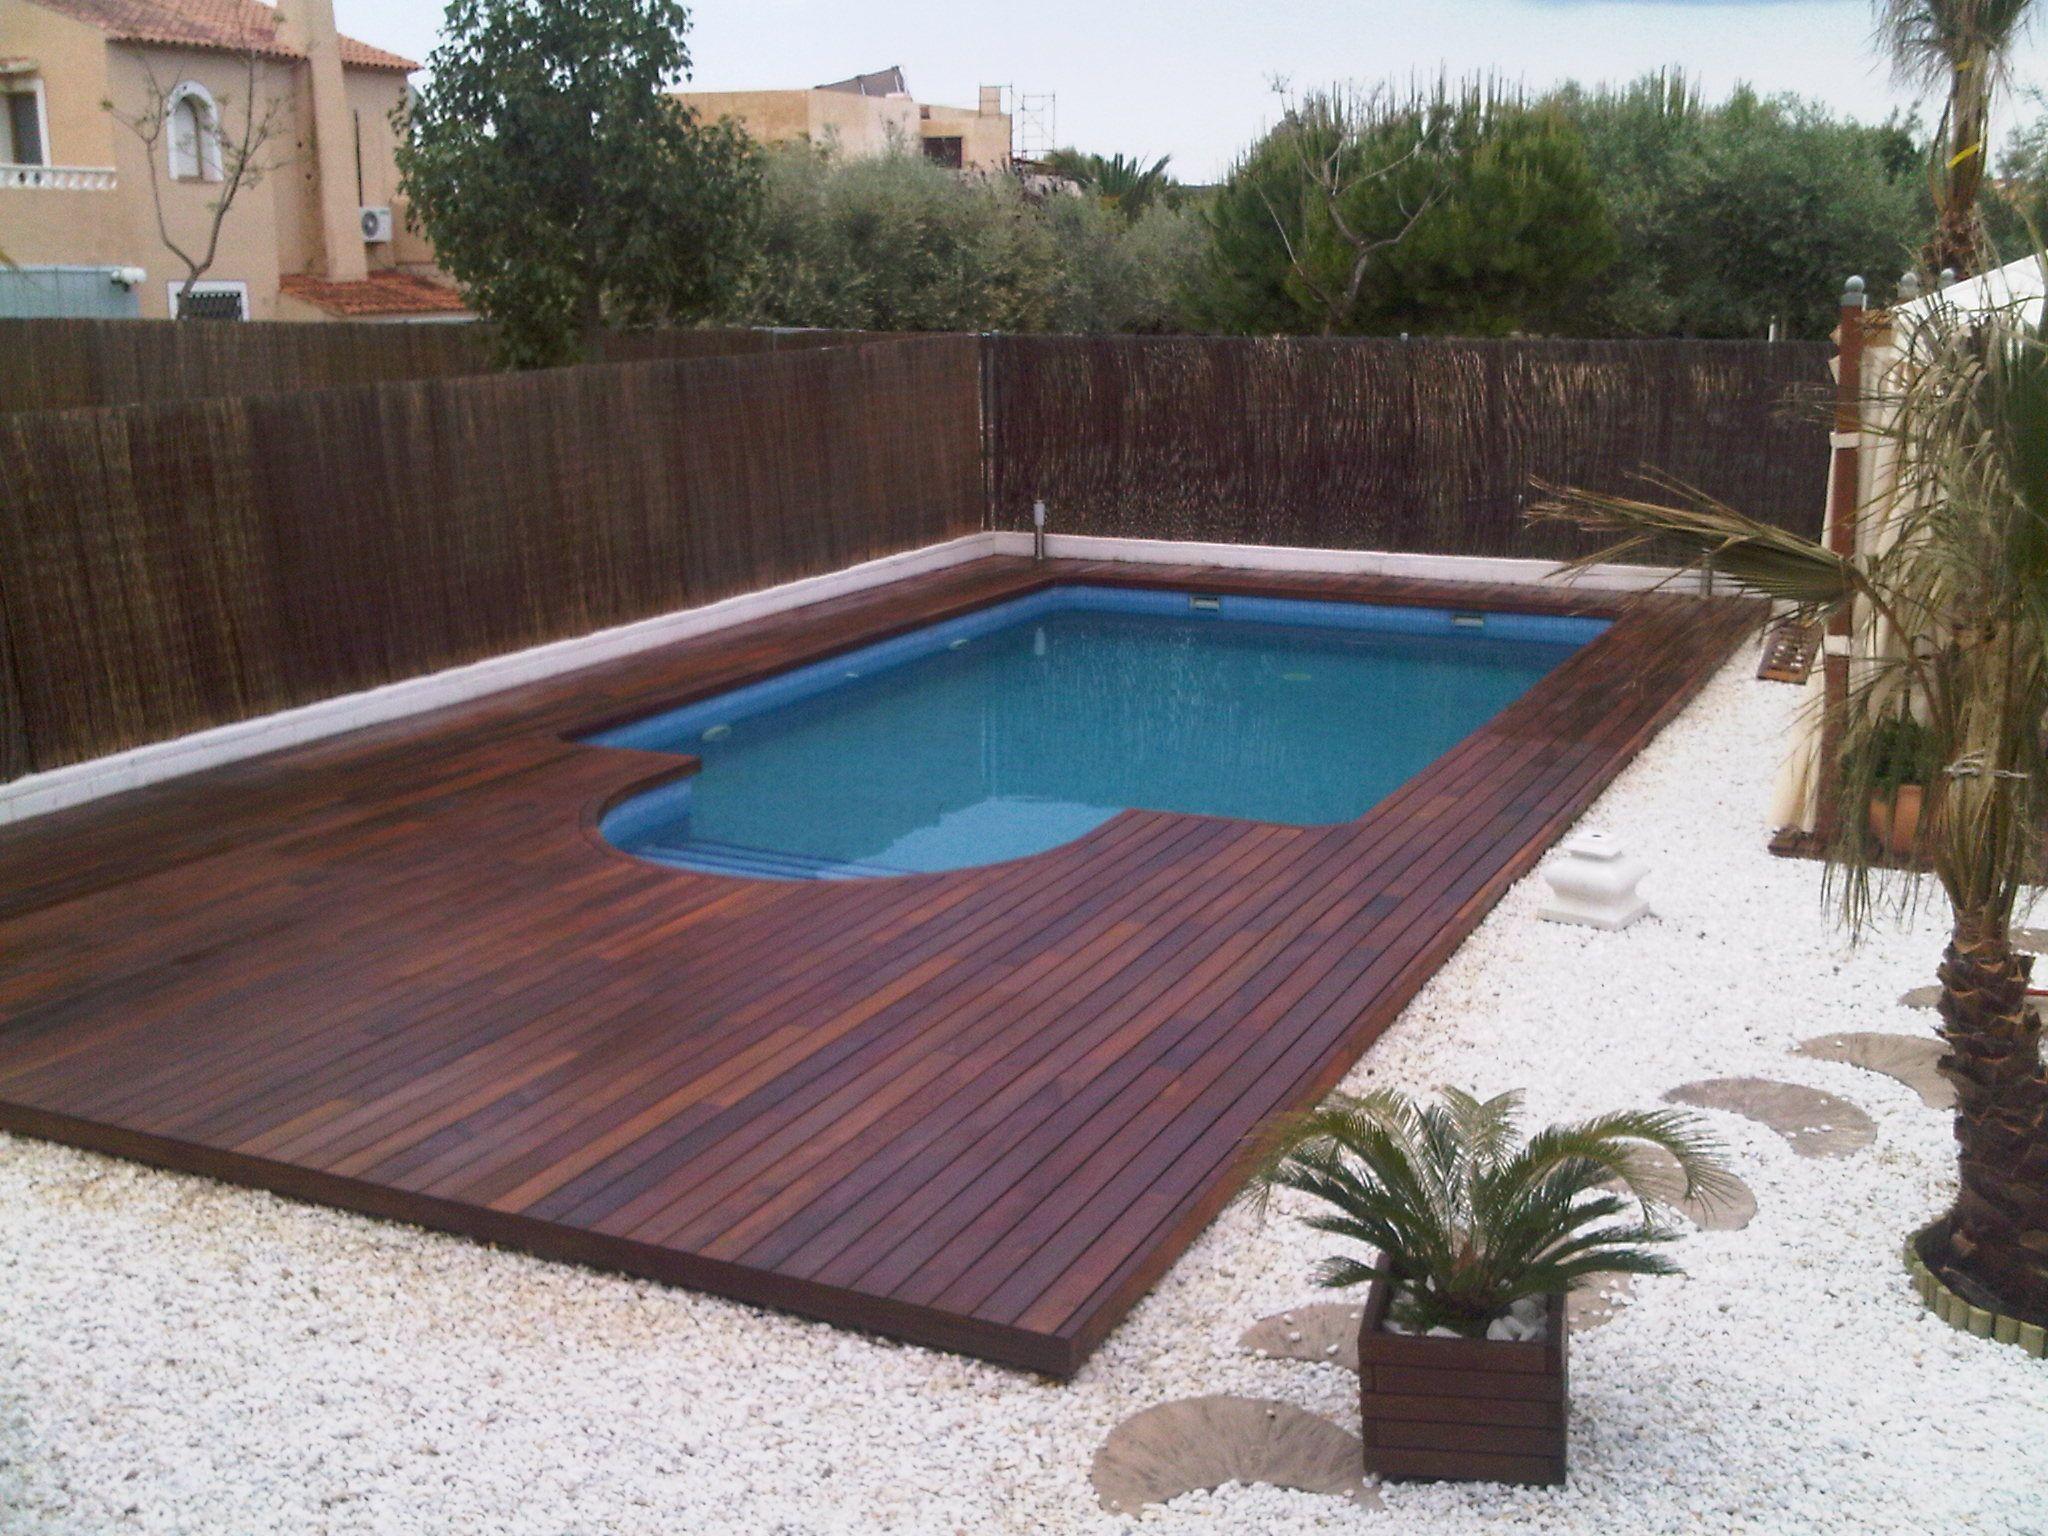 piscina realizada en tarima de exterior en madera de ipe